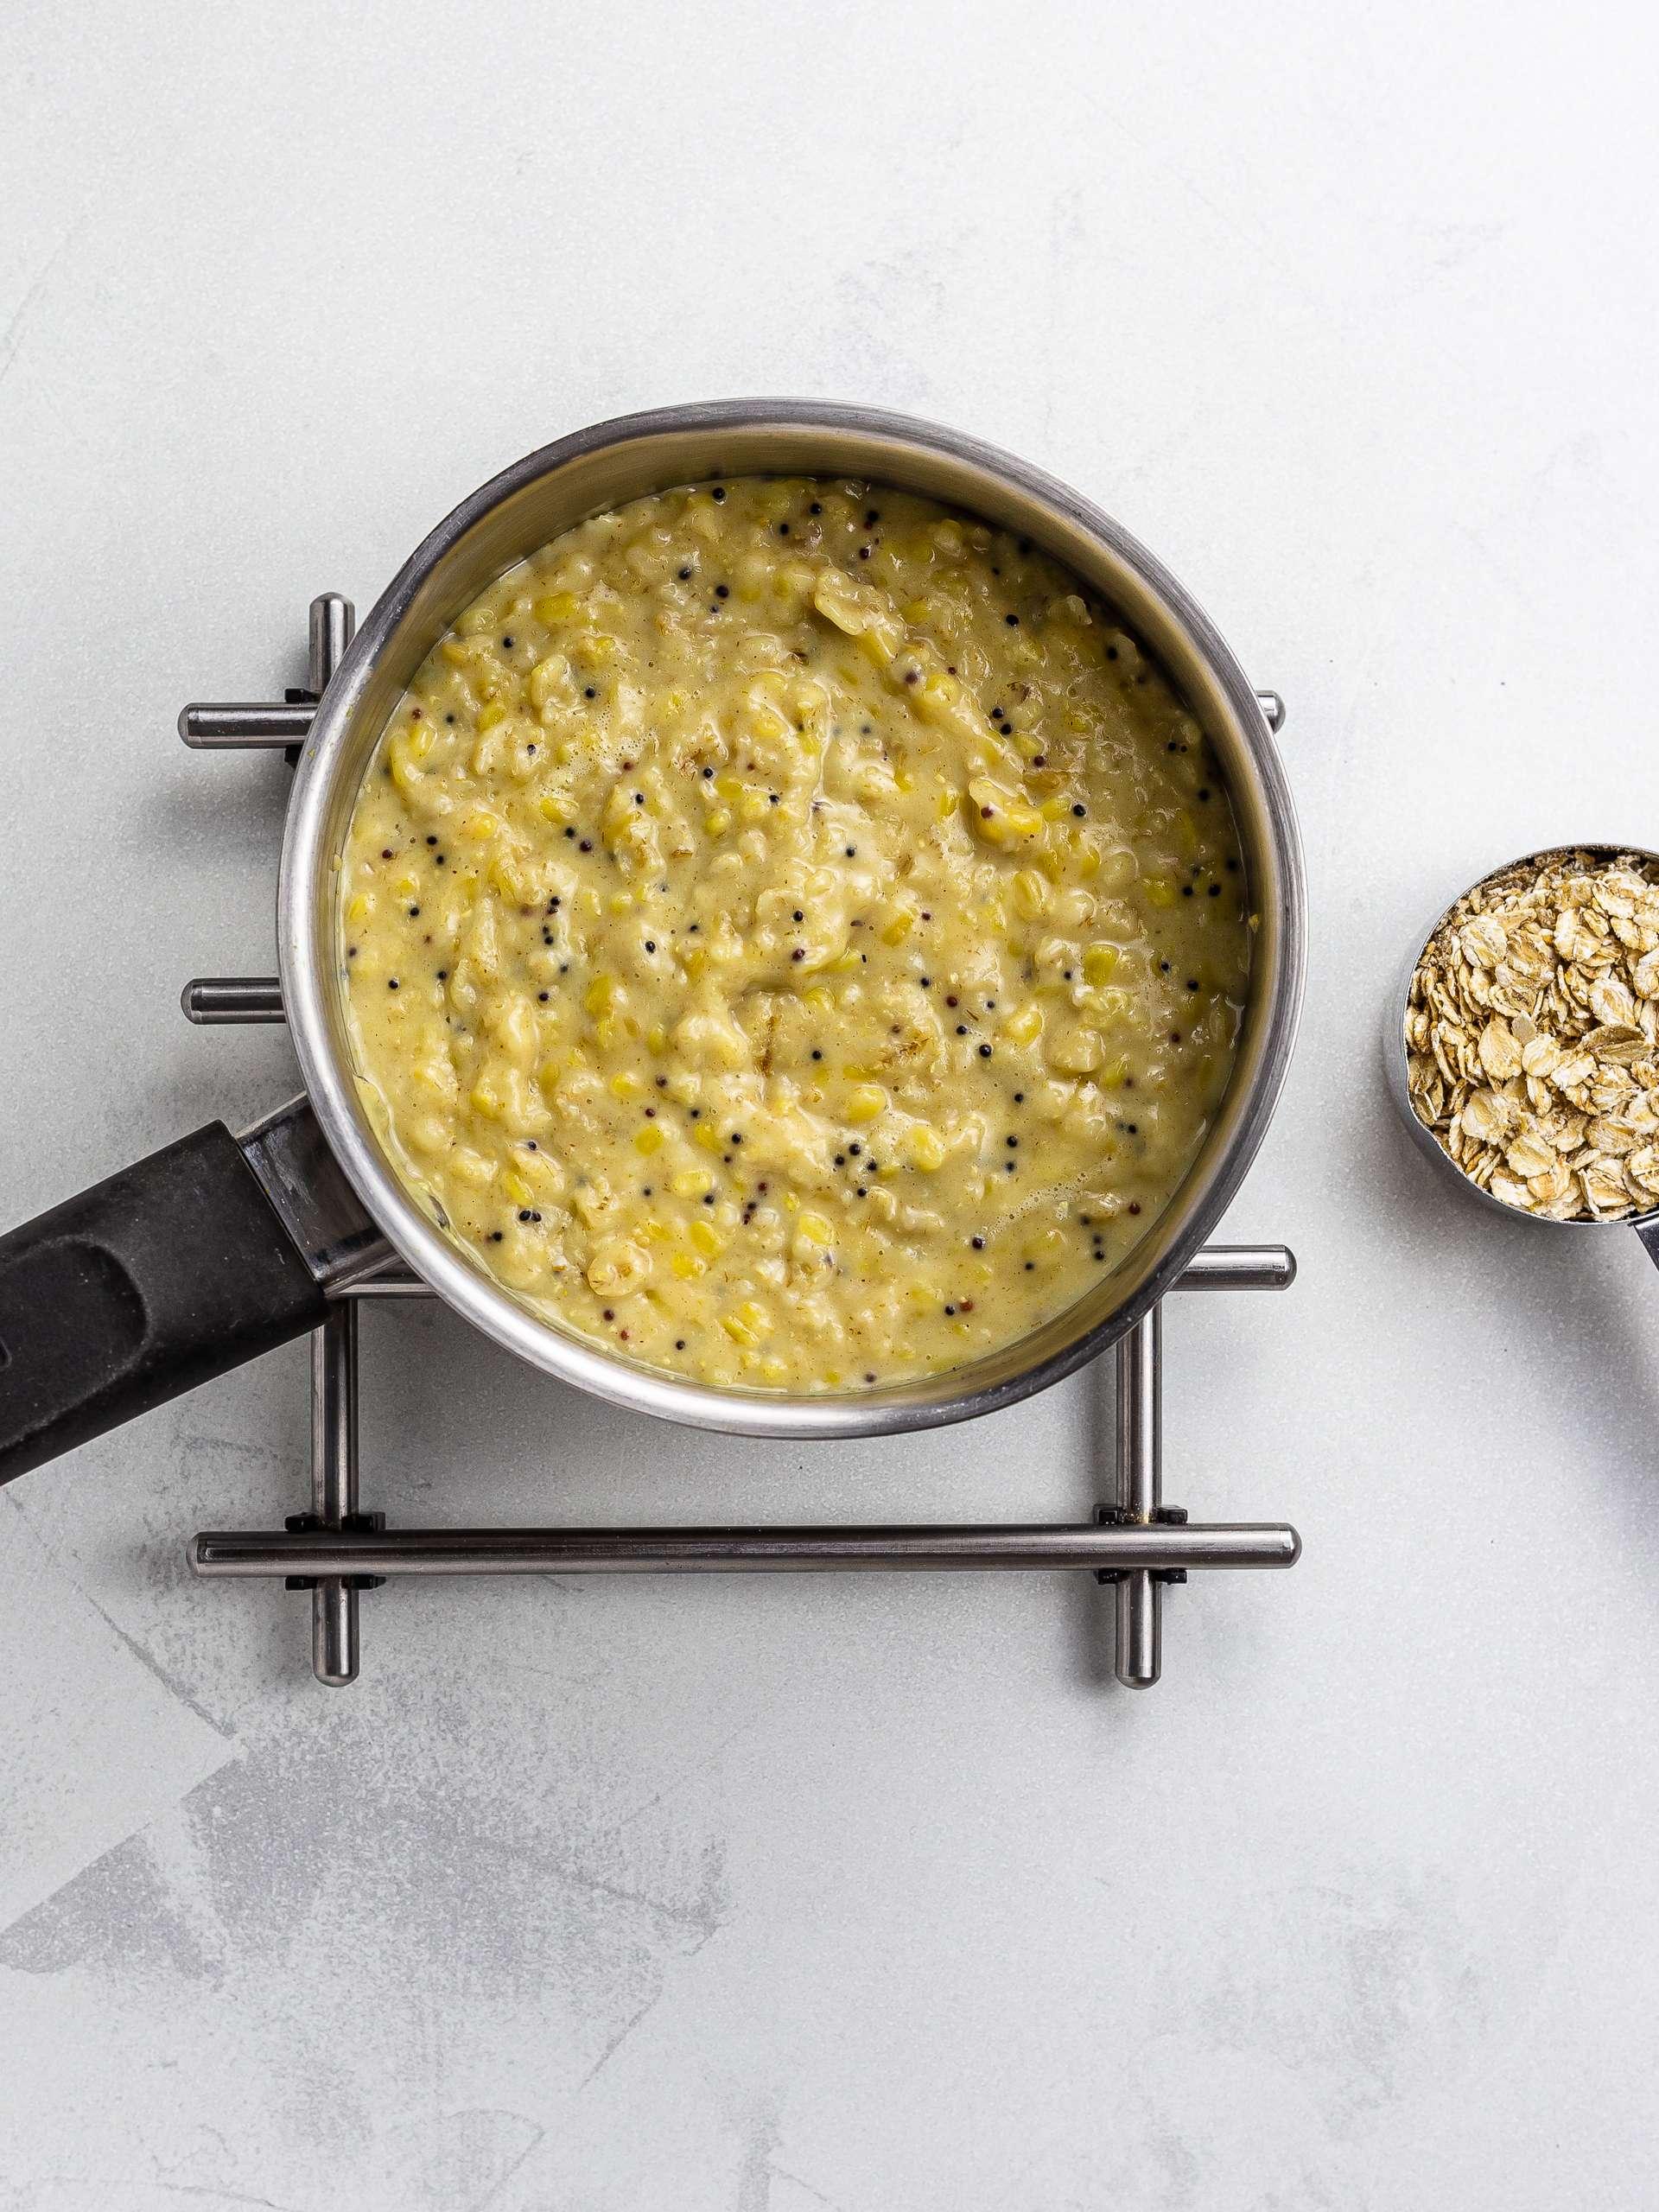 savoury curried oatmeal